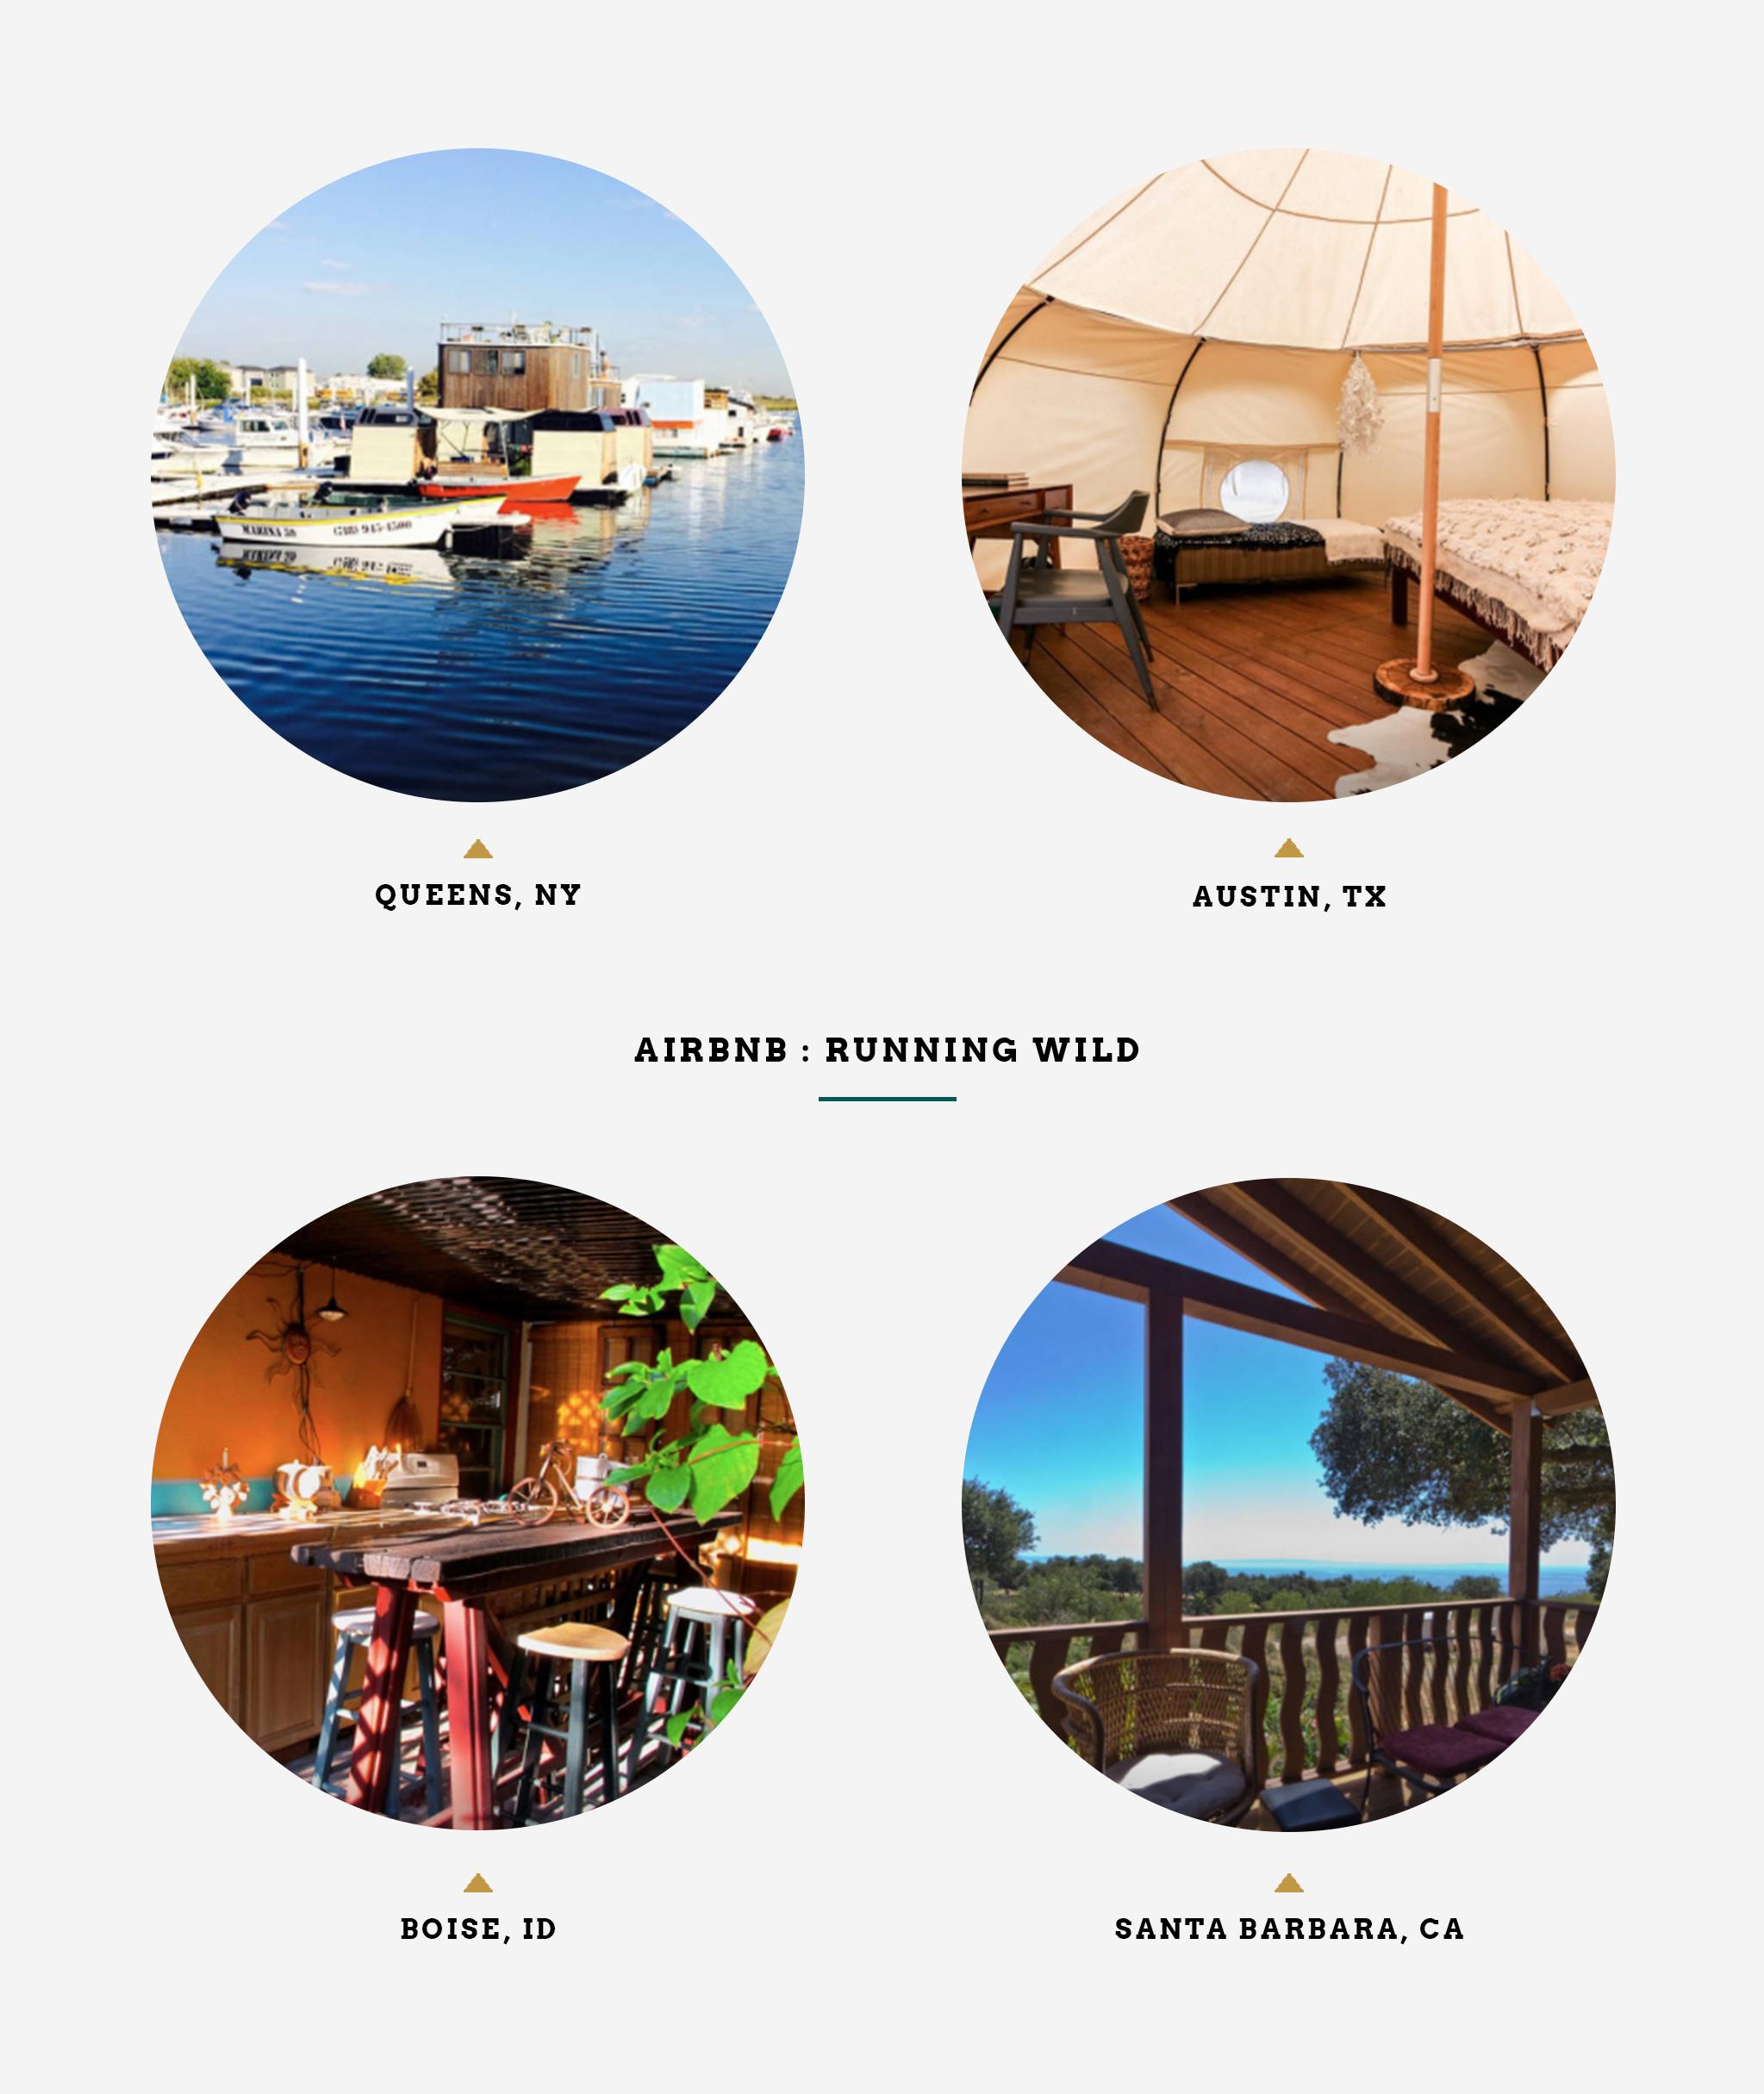 airbnb_travels_inbetweenthecurlsblog